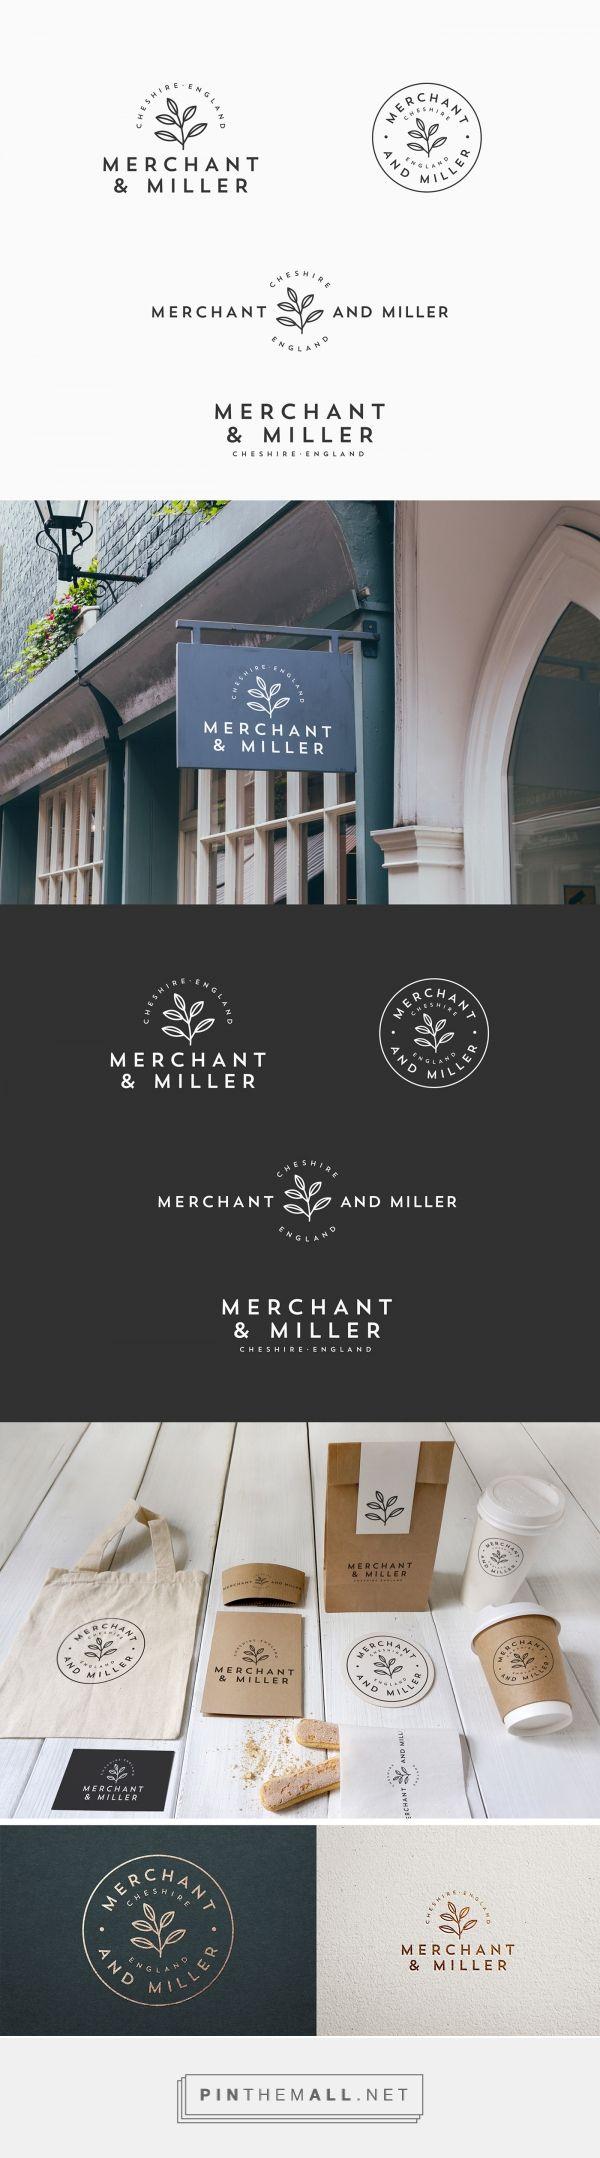 Merchant & Miller Logo by Ceren Burcu Turkan | Fivestar Branding Agency – Design and Branding Agency & Curated Inspiration Gallery #logo #logoinspirations